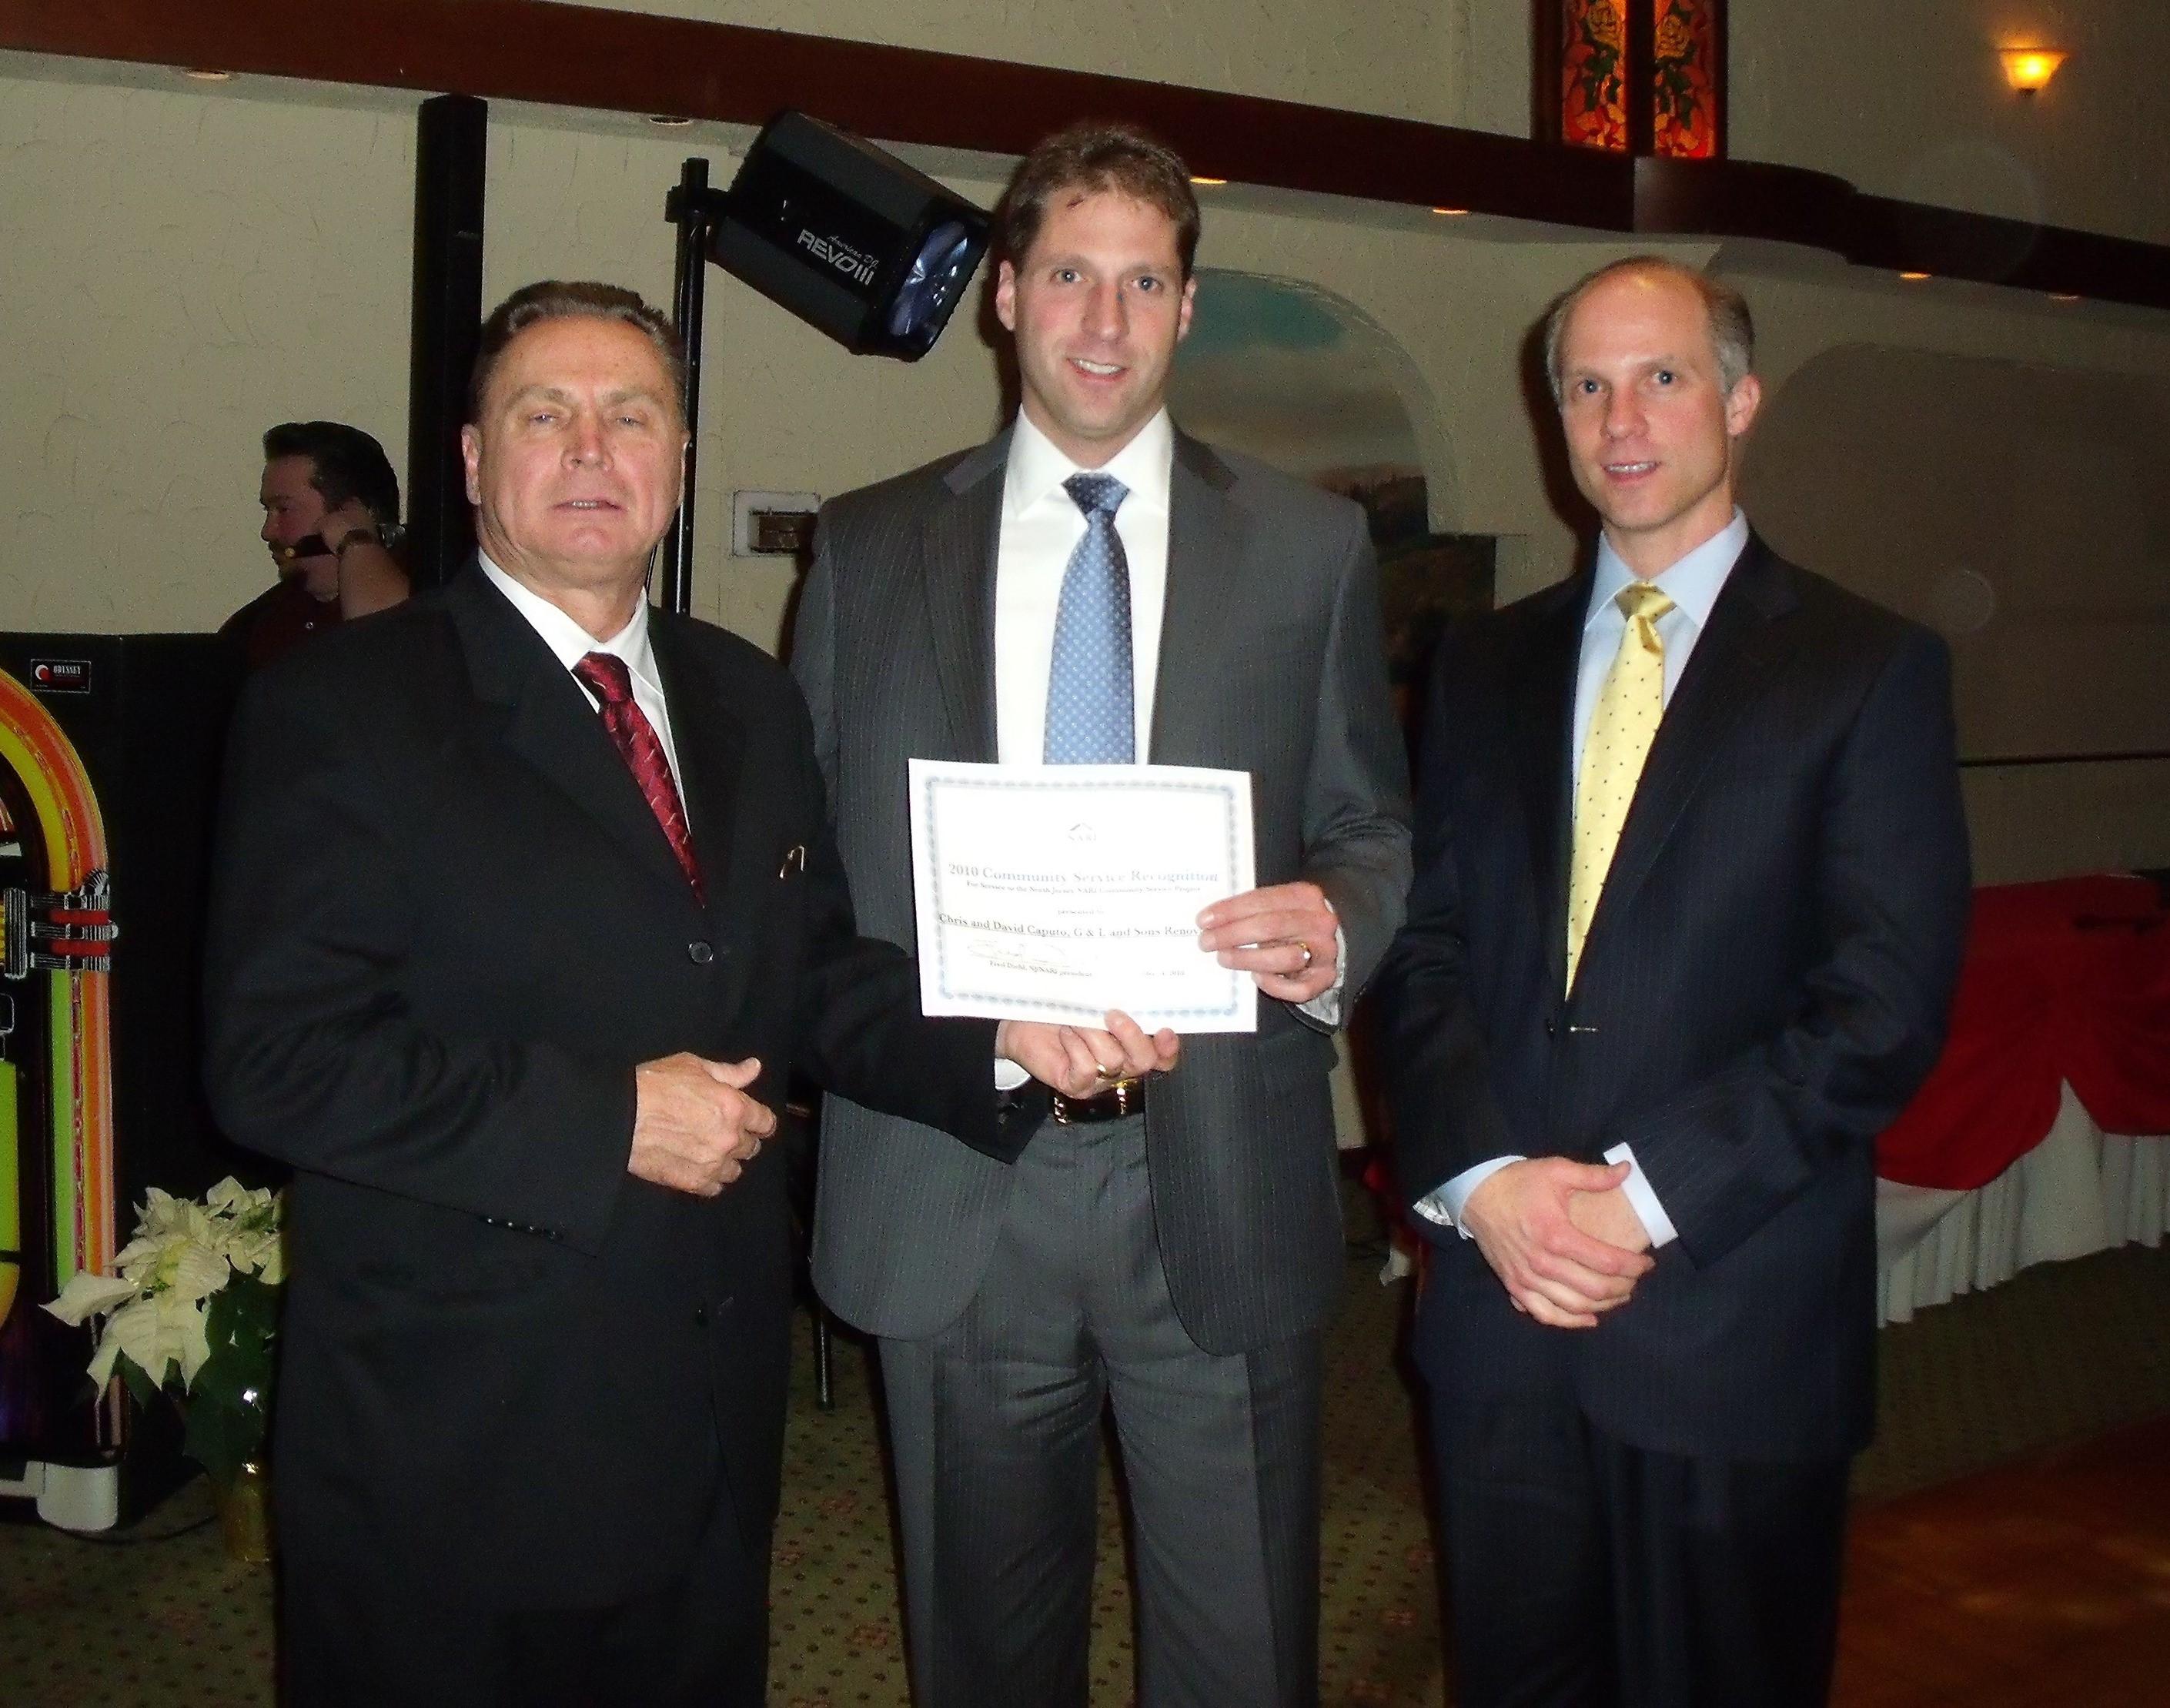 2011-CoTY-Award-Presentation-3